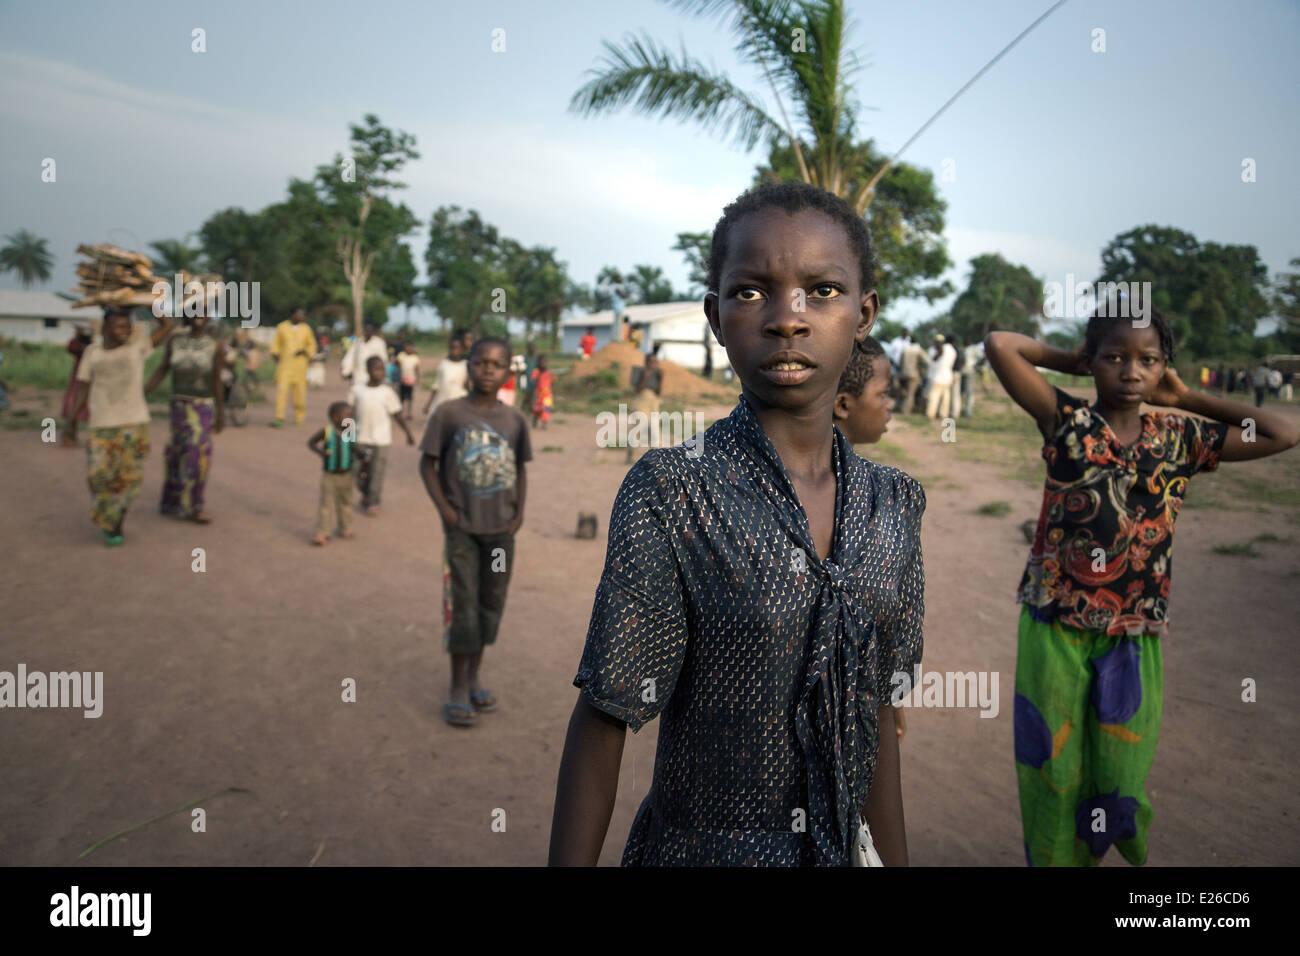 Central African Republic Refugee children in Boyabu refugee camp in Democratic Republic of Congo. - Stock Image